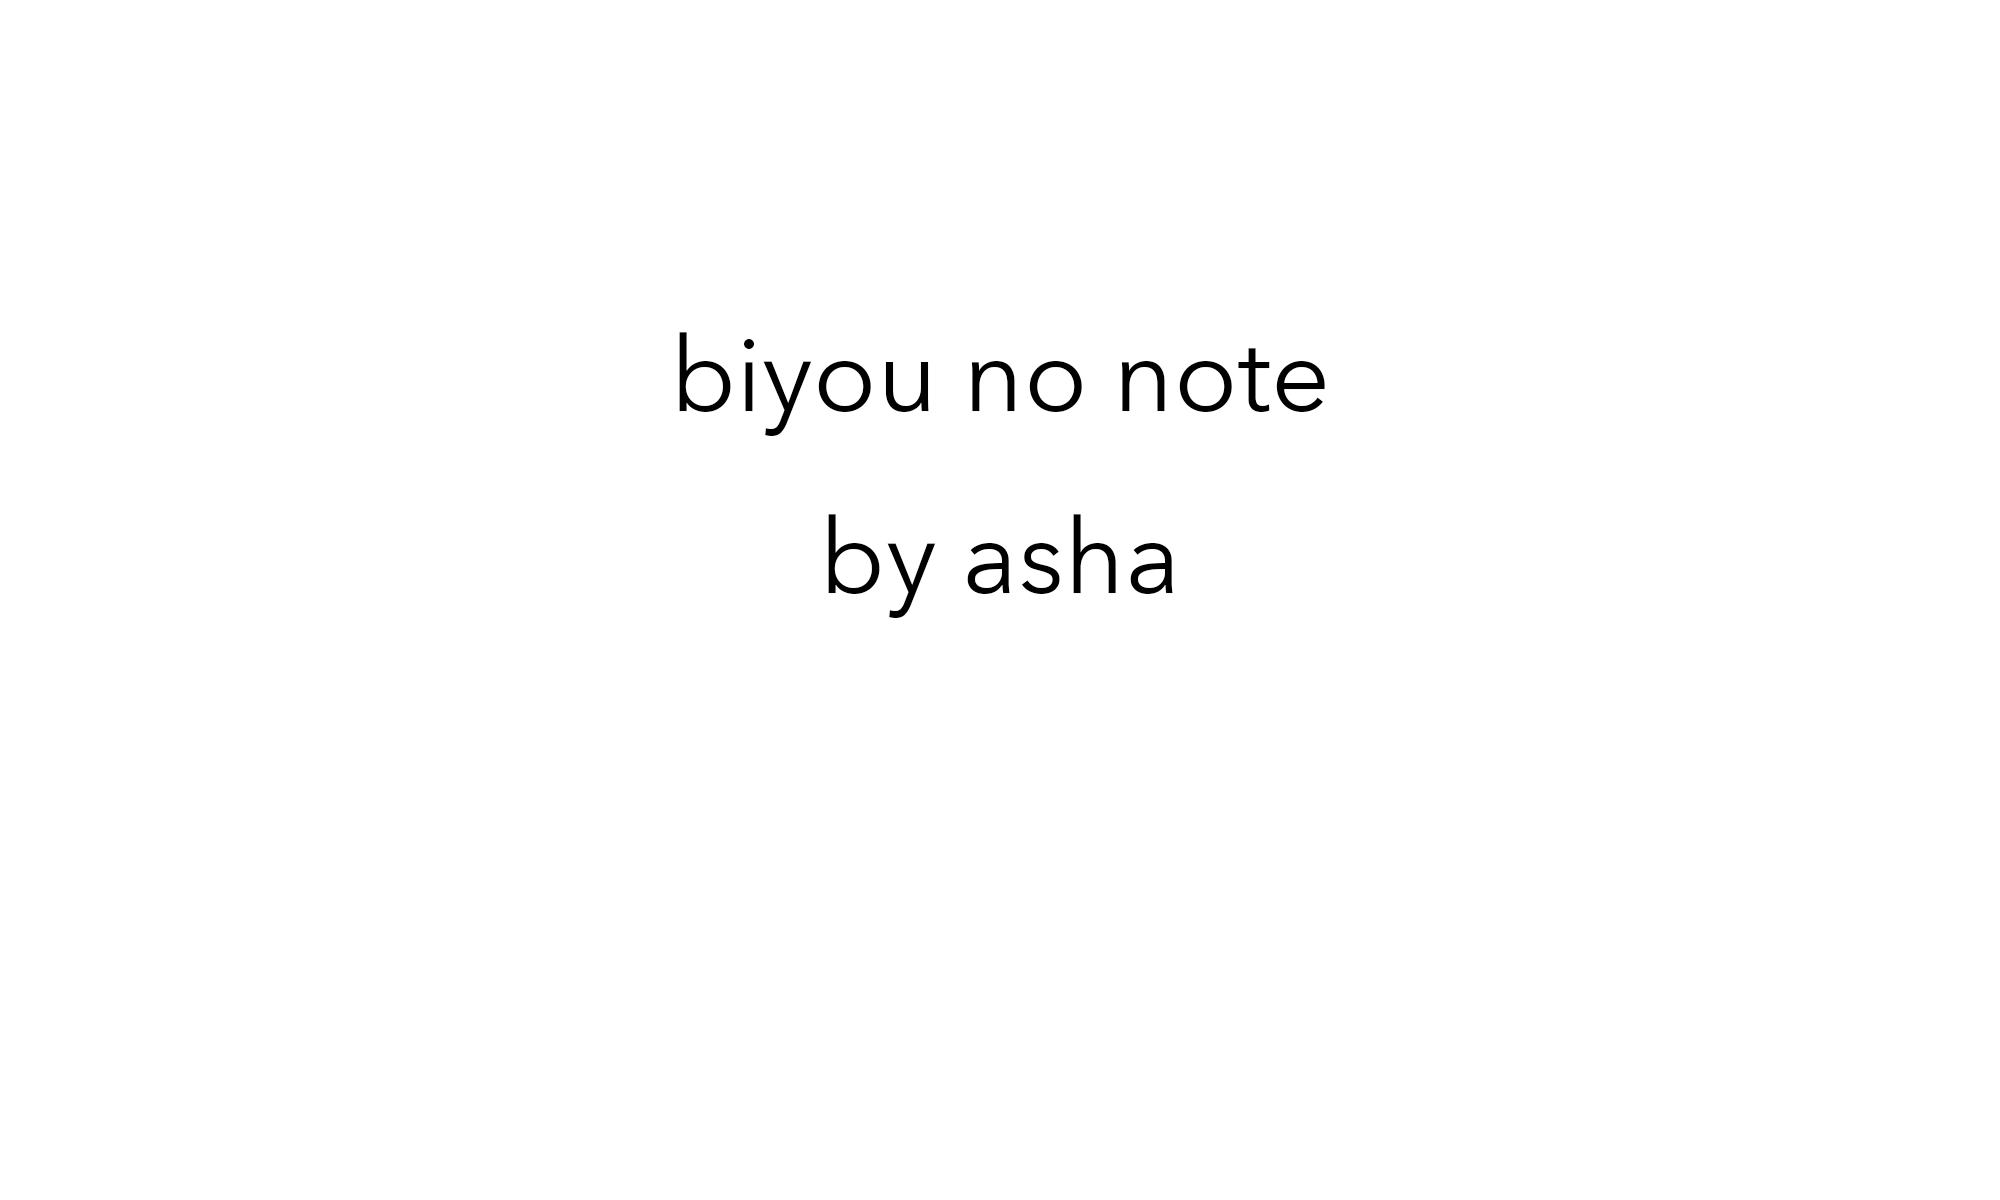 biyou no note